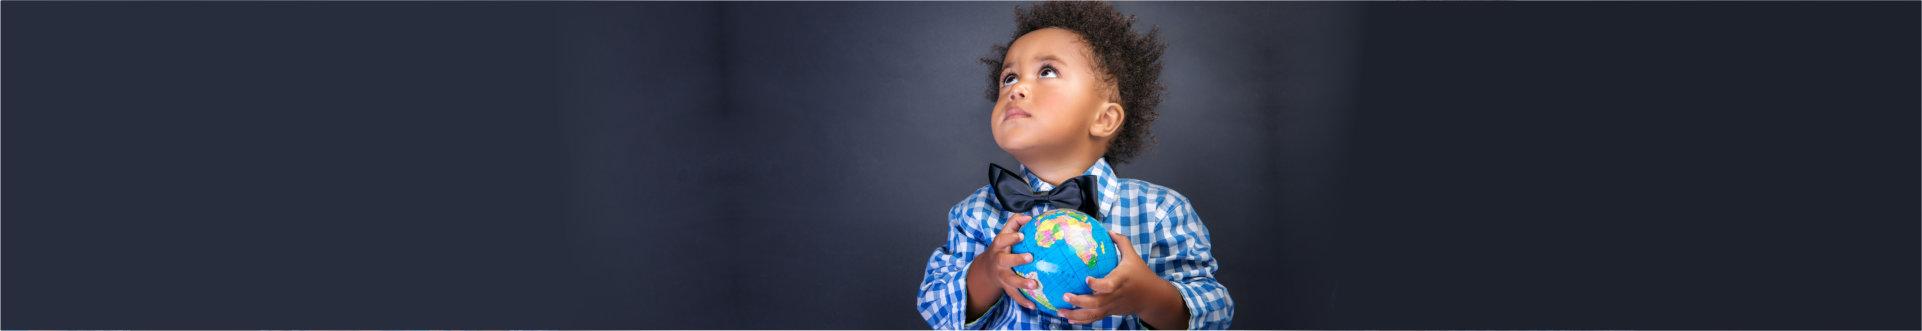 child carrying globe